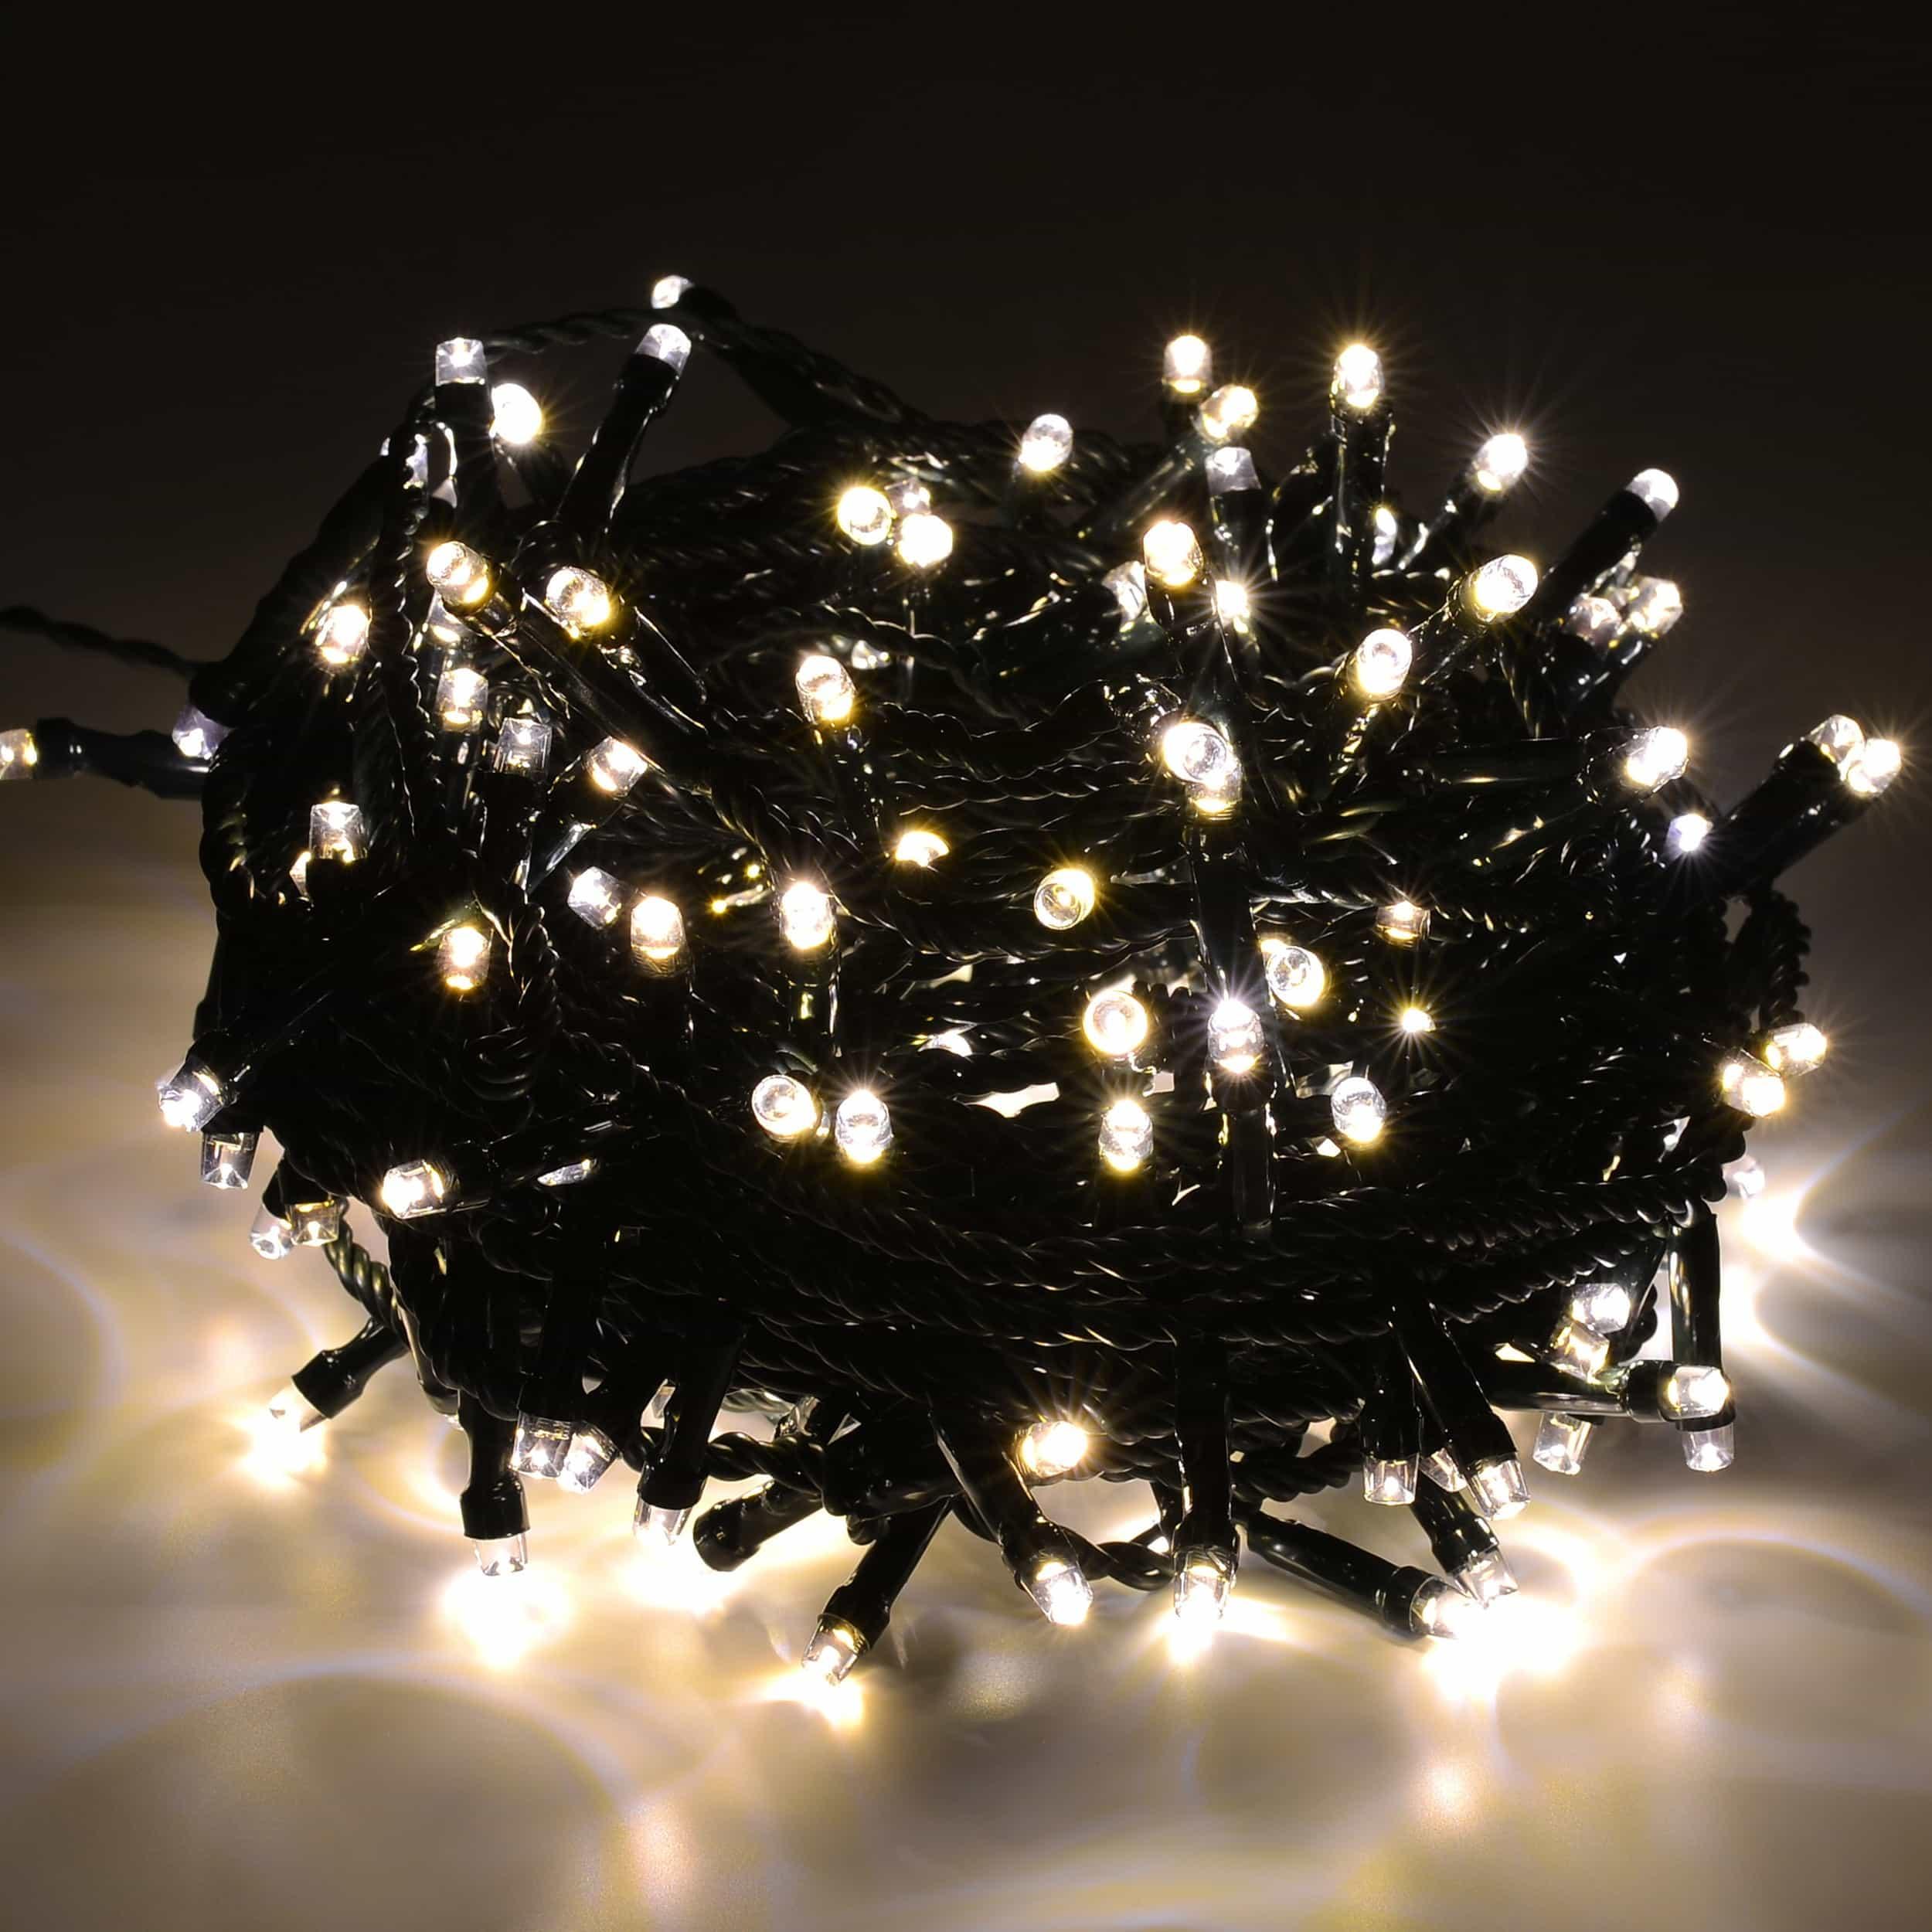 LED Lichterkette 800 LED energiesparend L40m warmweiß